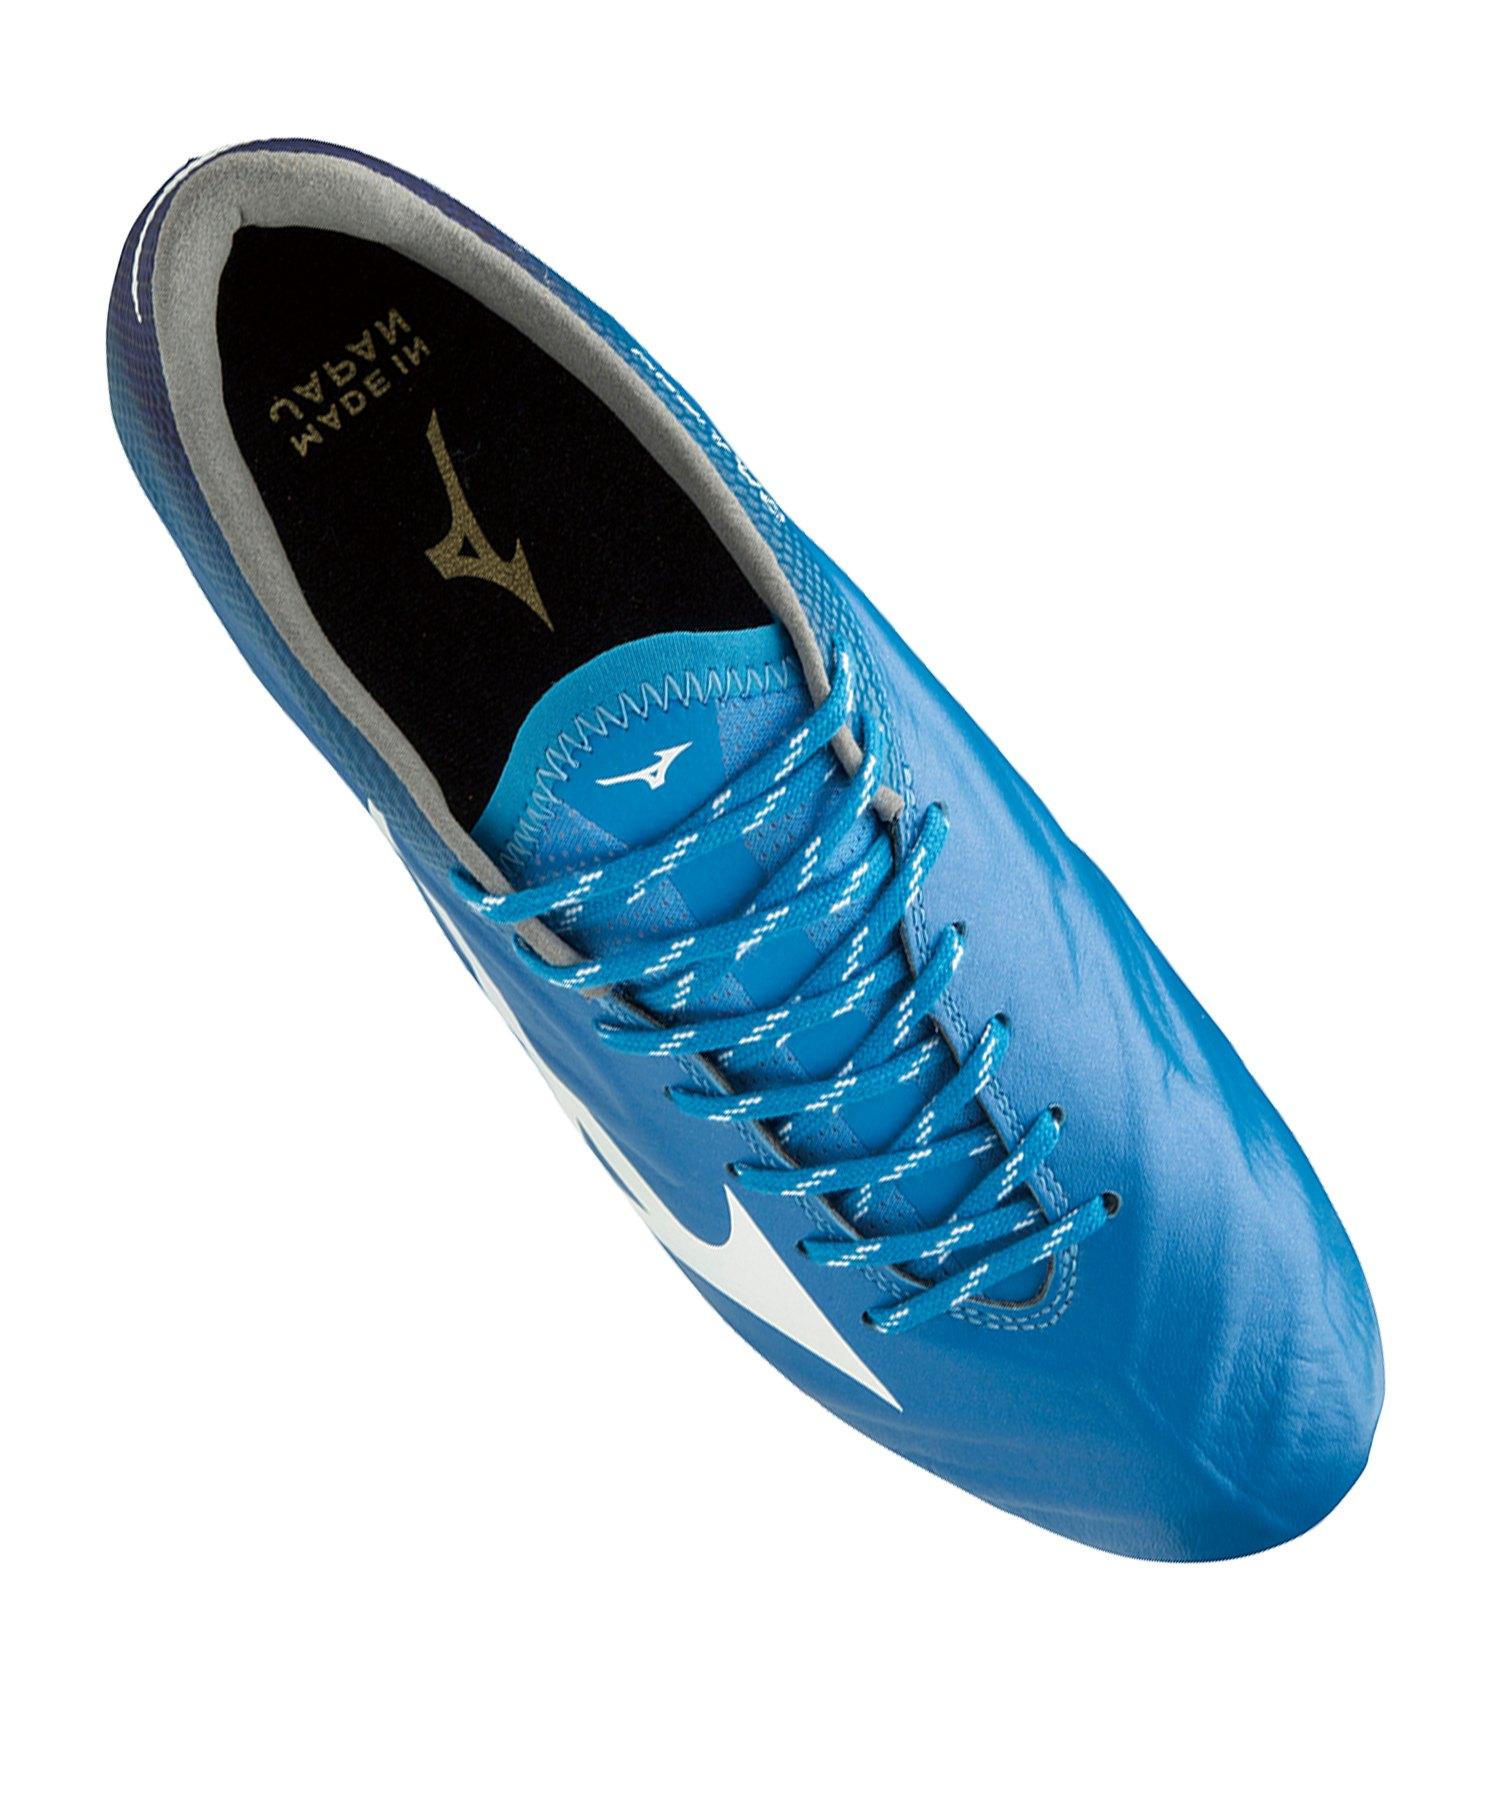 Mizuno Fg Weiss F01 Rebula V1 Japan Leather Blau 2 ARjL435